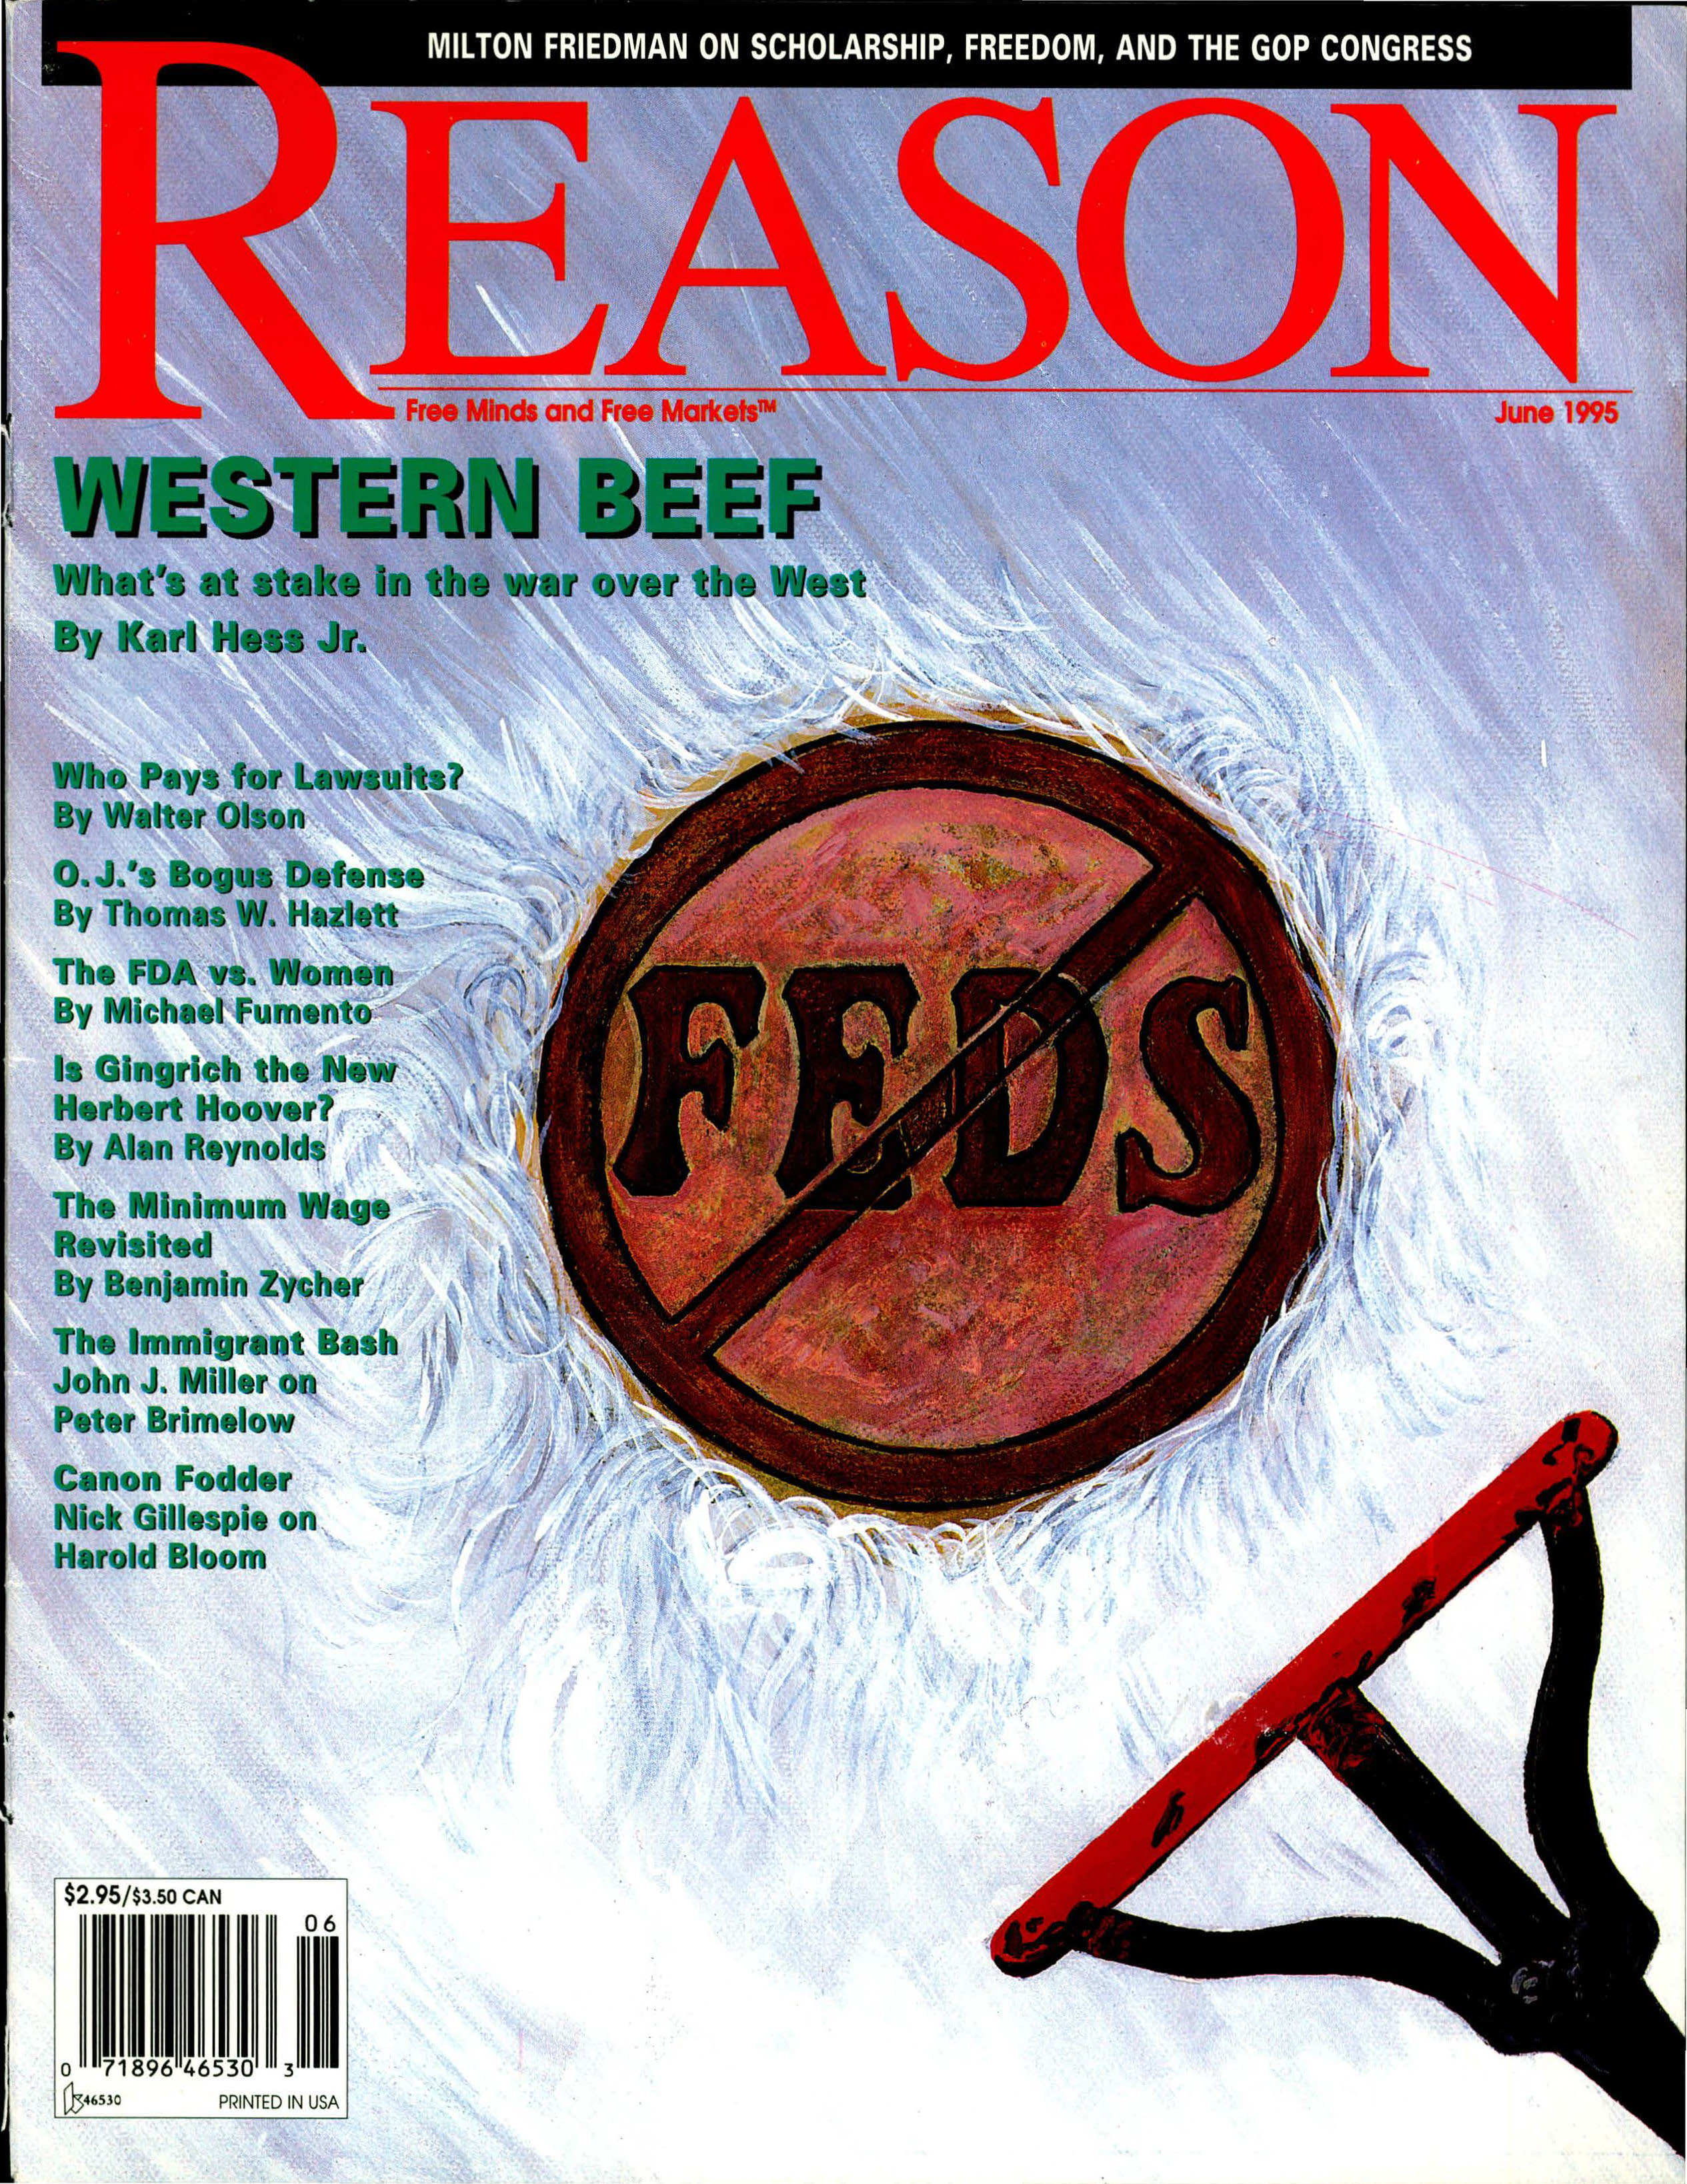 Reason Magazine, June 1995 cover image